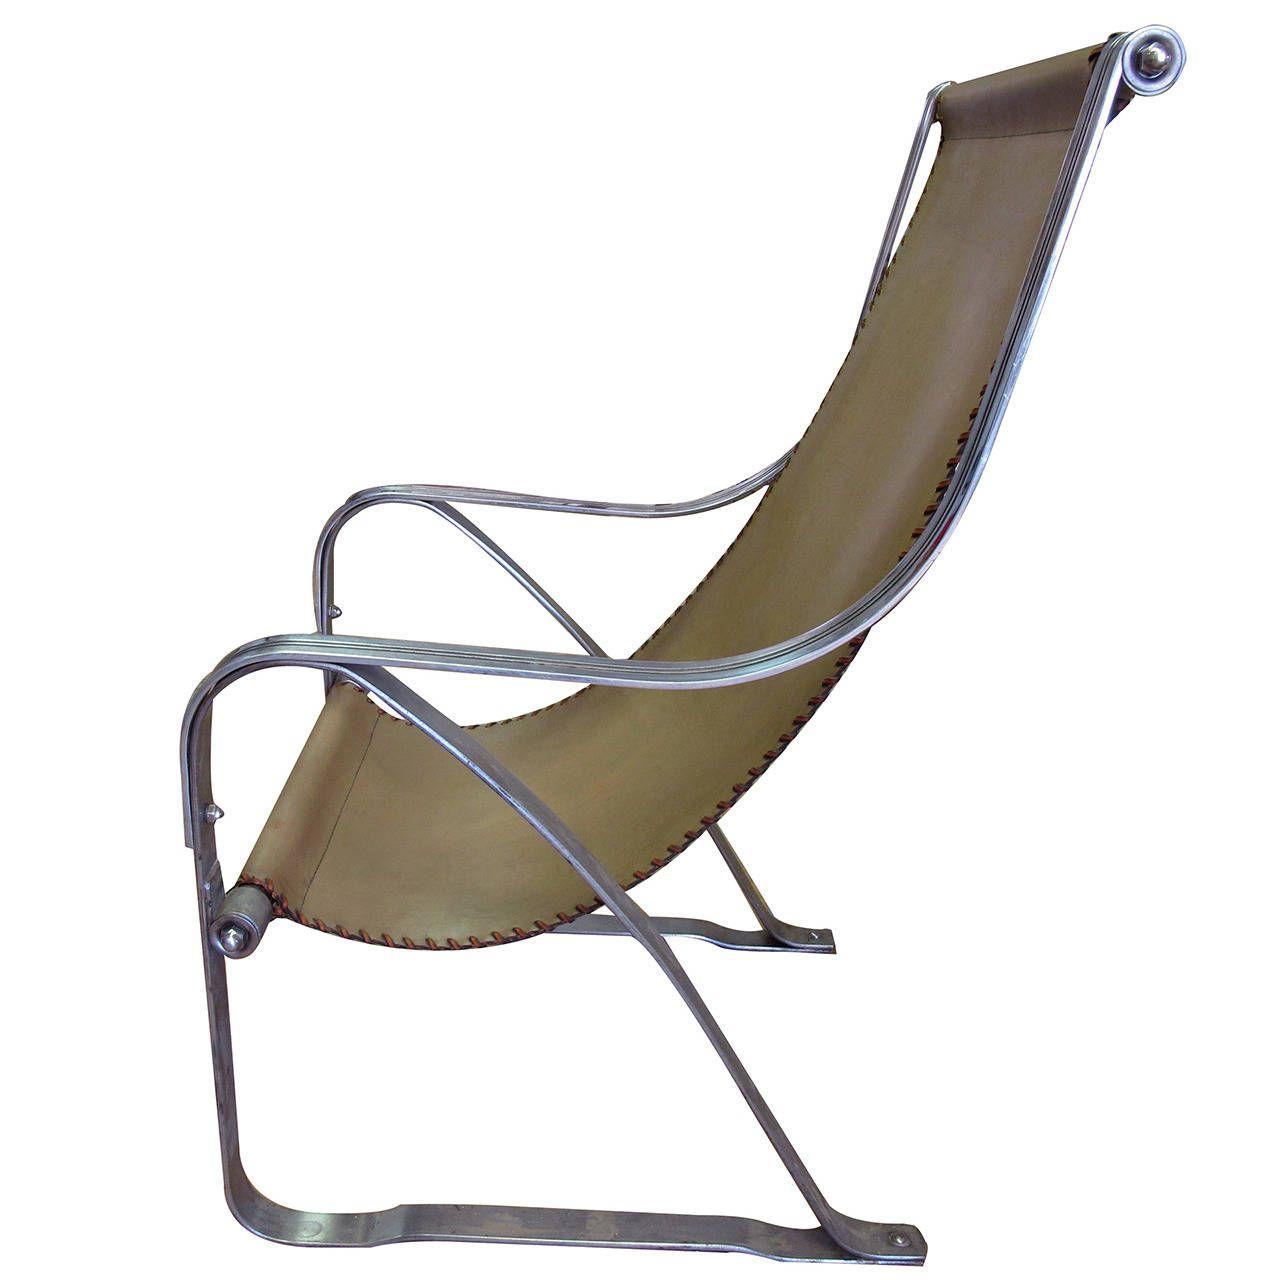 A Rare American Machine Age Art Deco Spring Chair By John McKay